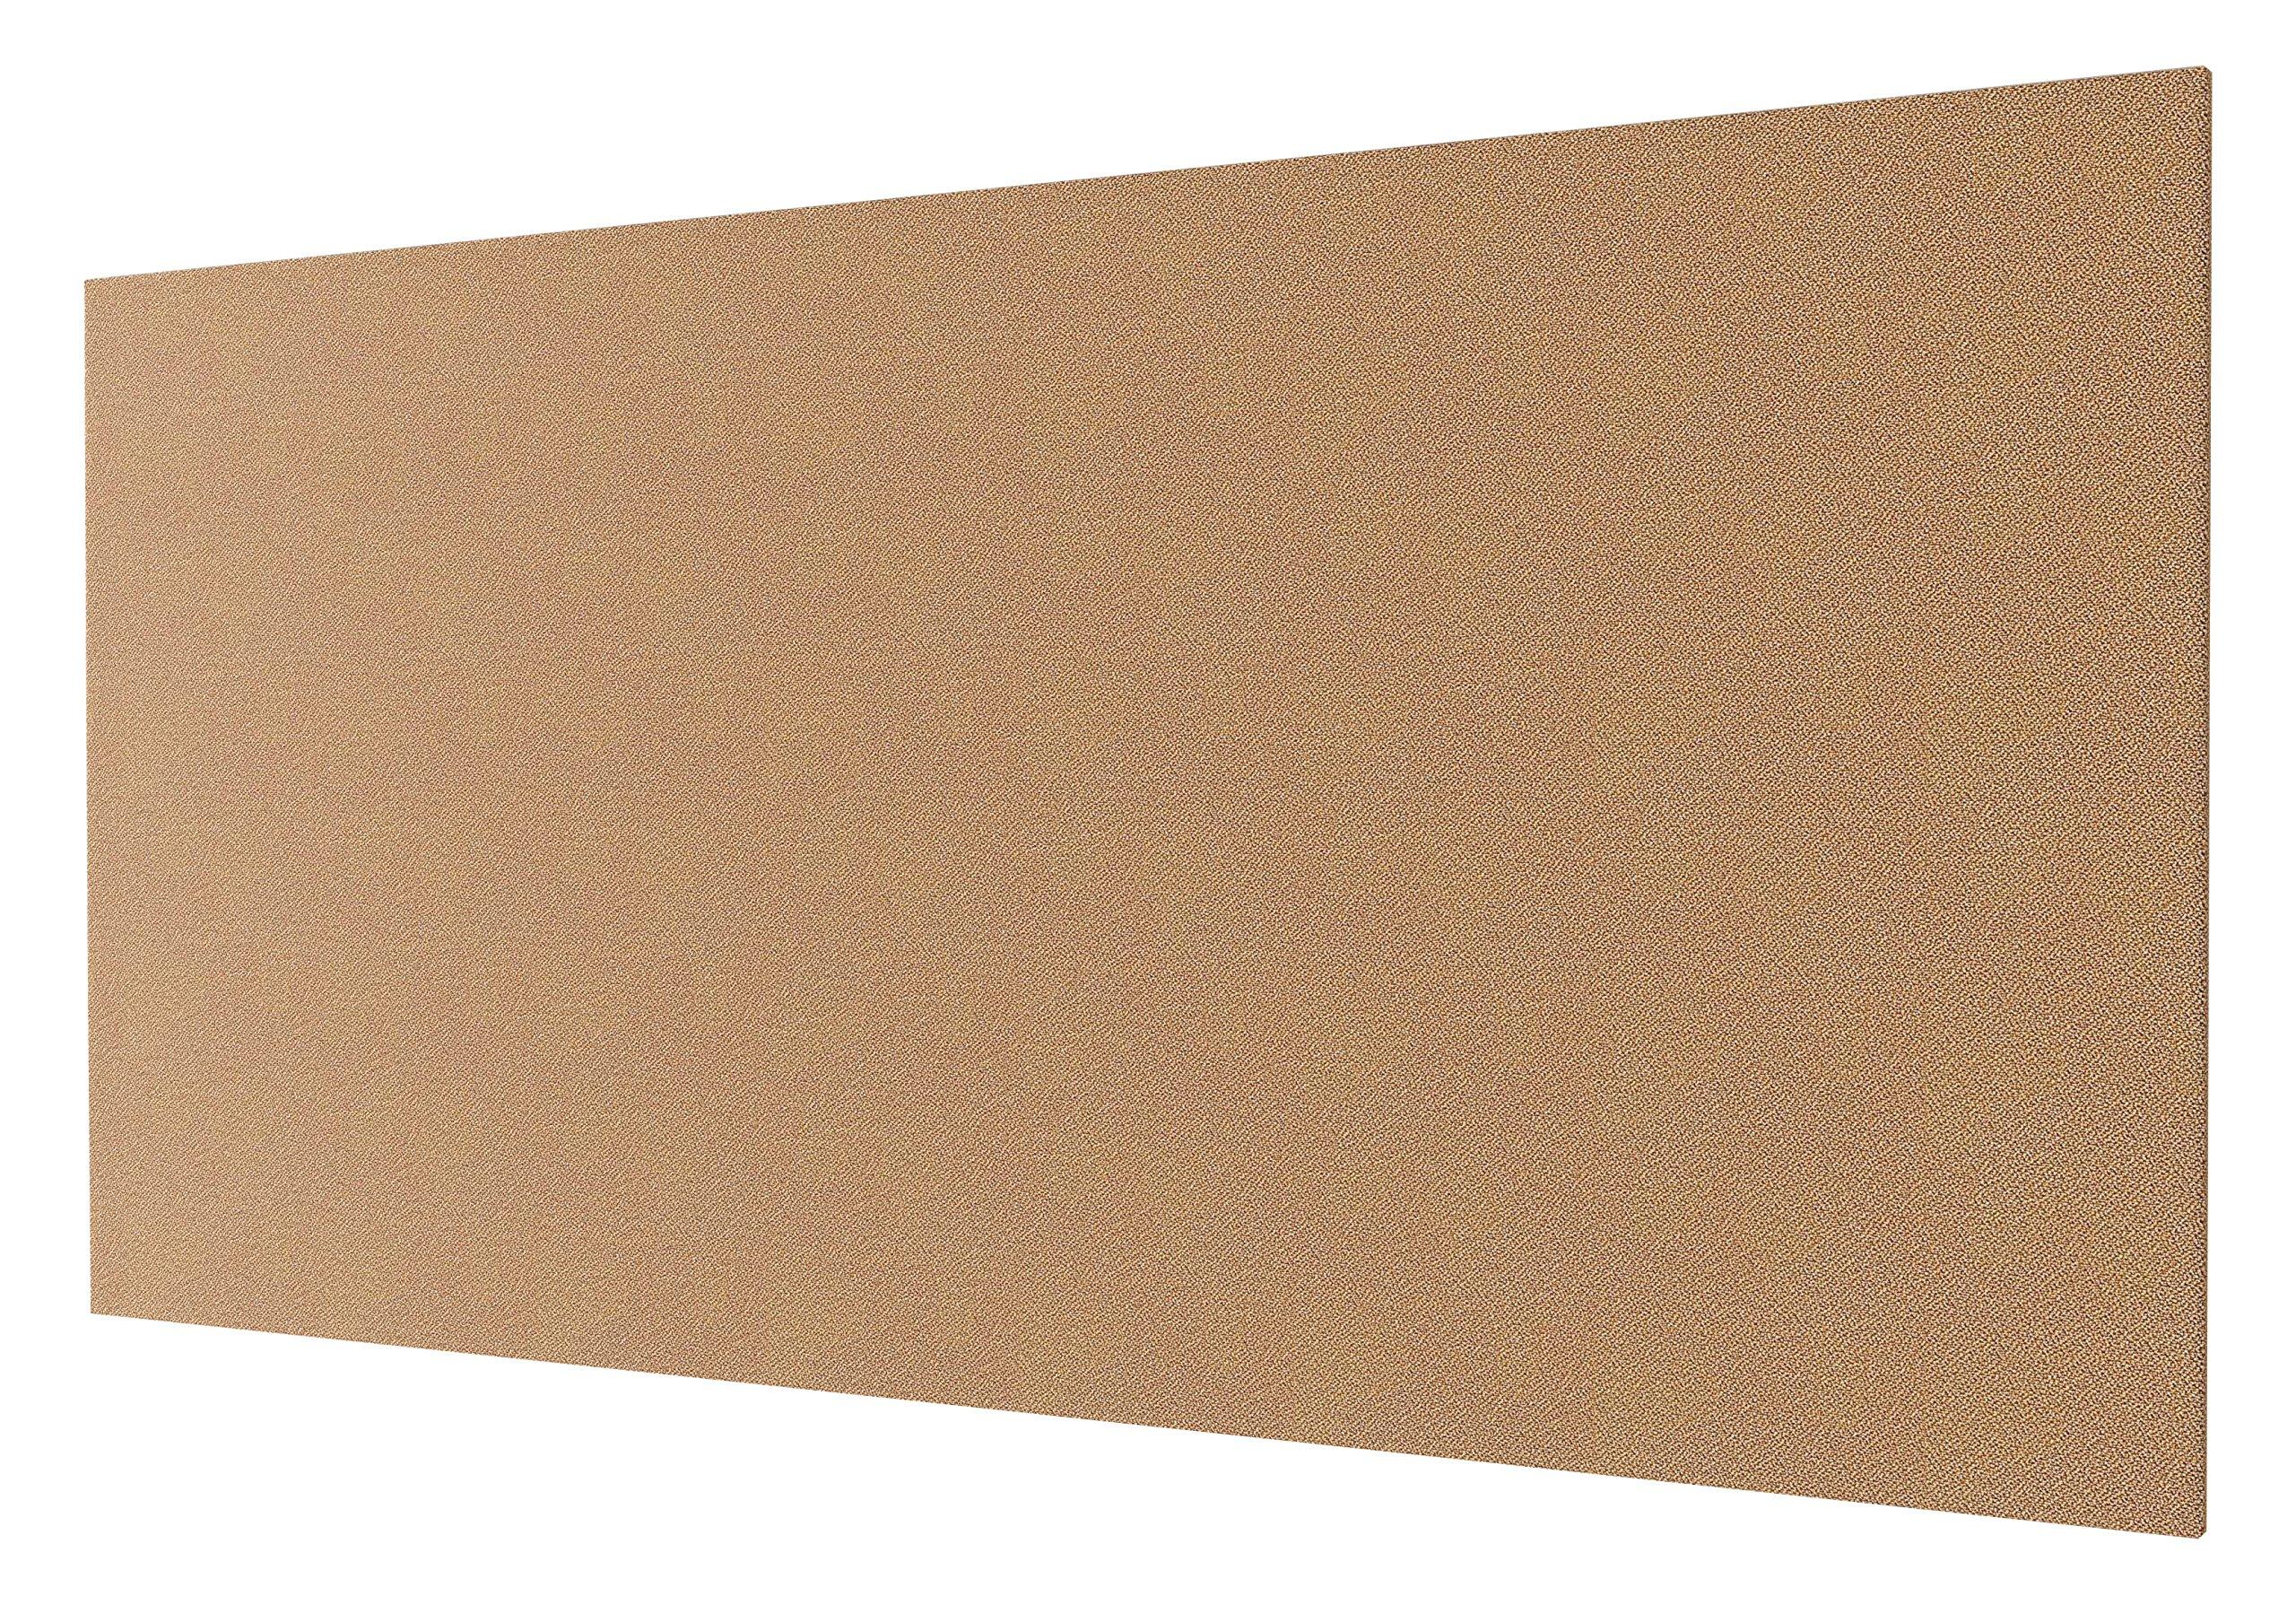 OBEX 30X60-TB-R-CA Rectangle Tackboard Contemporary Caramel